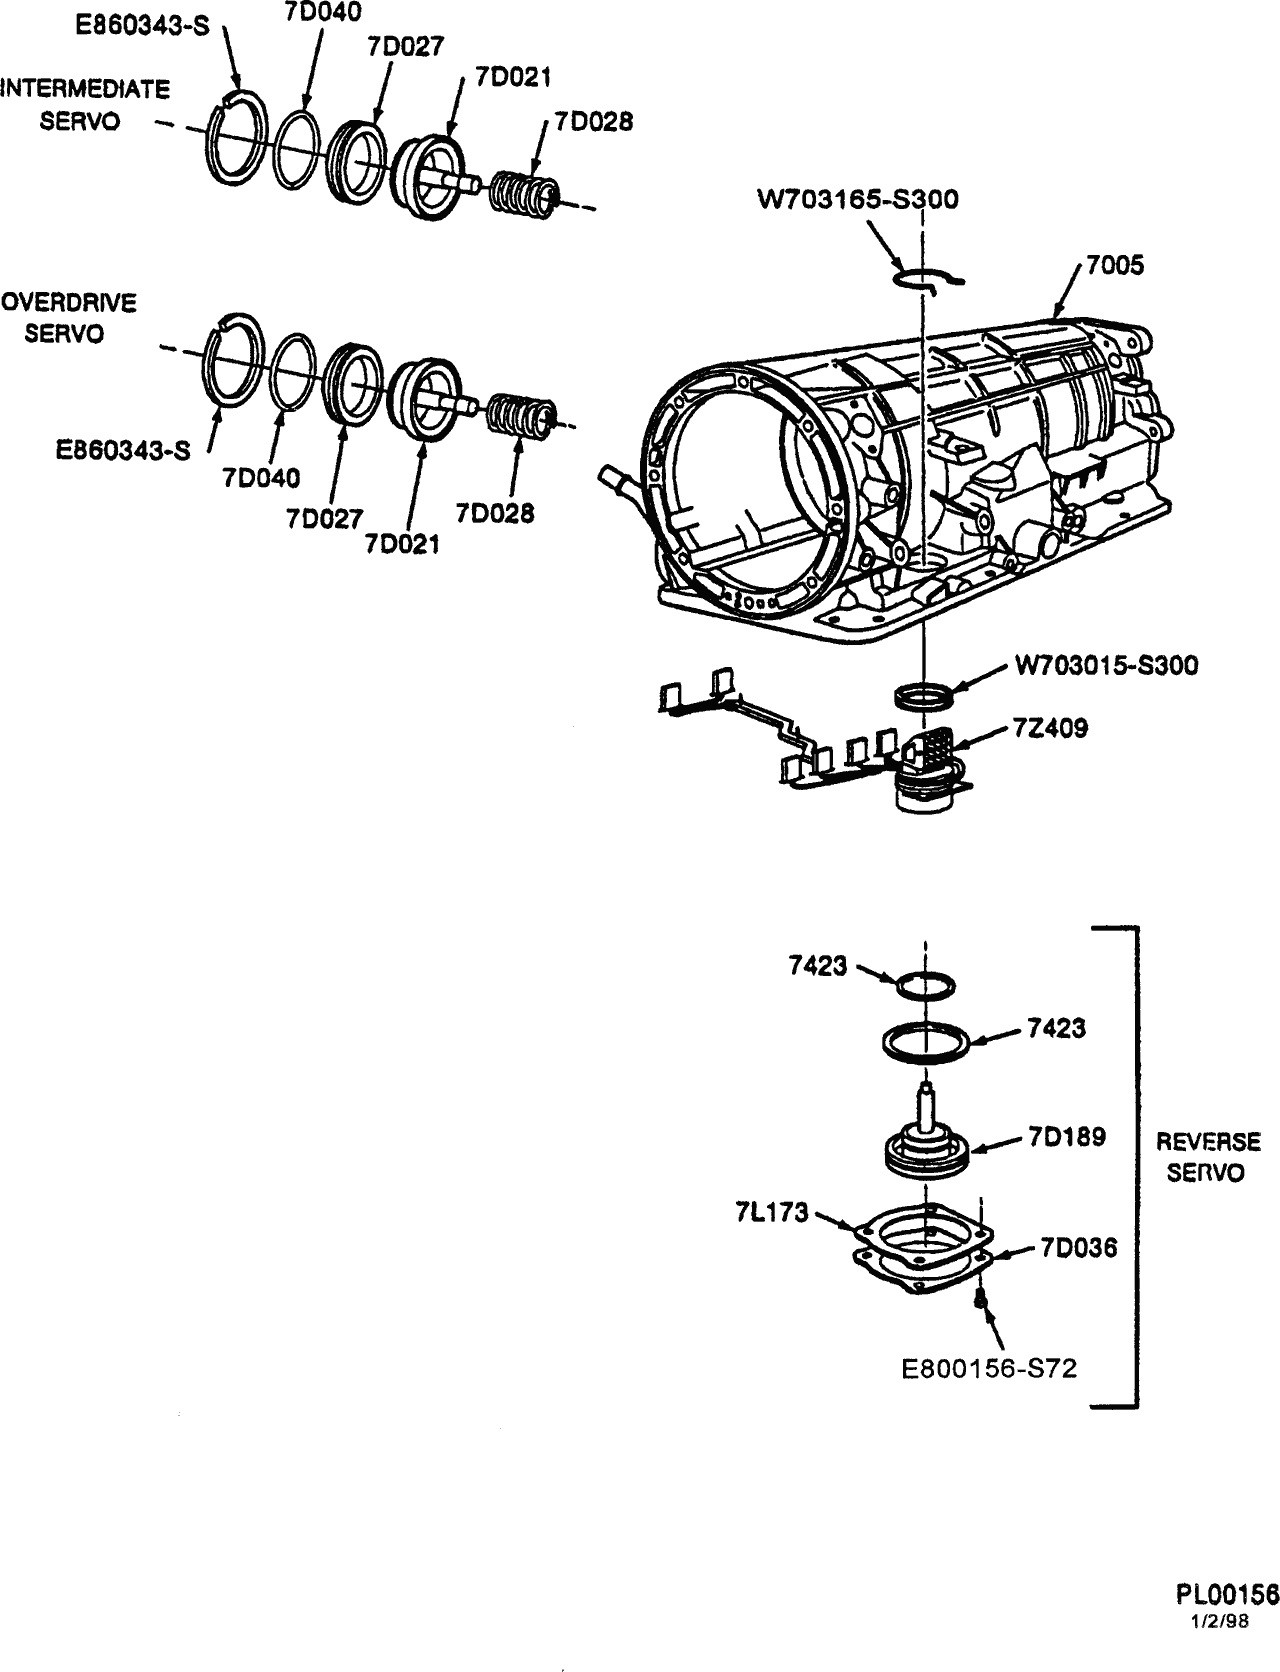 Ford Ranger Parts Diagram 4r100 Transmission Valve Body